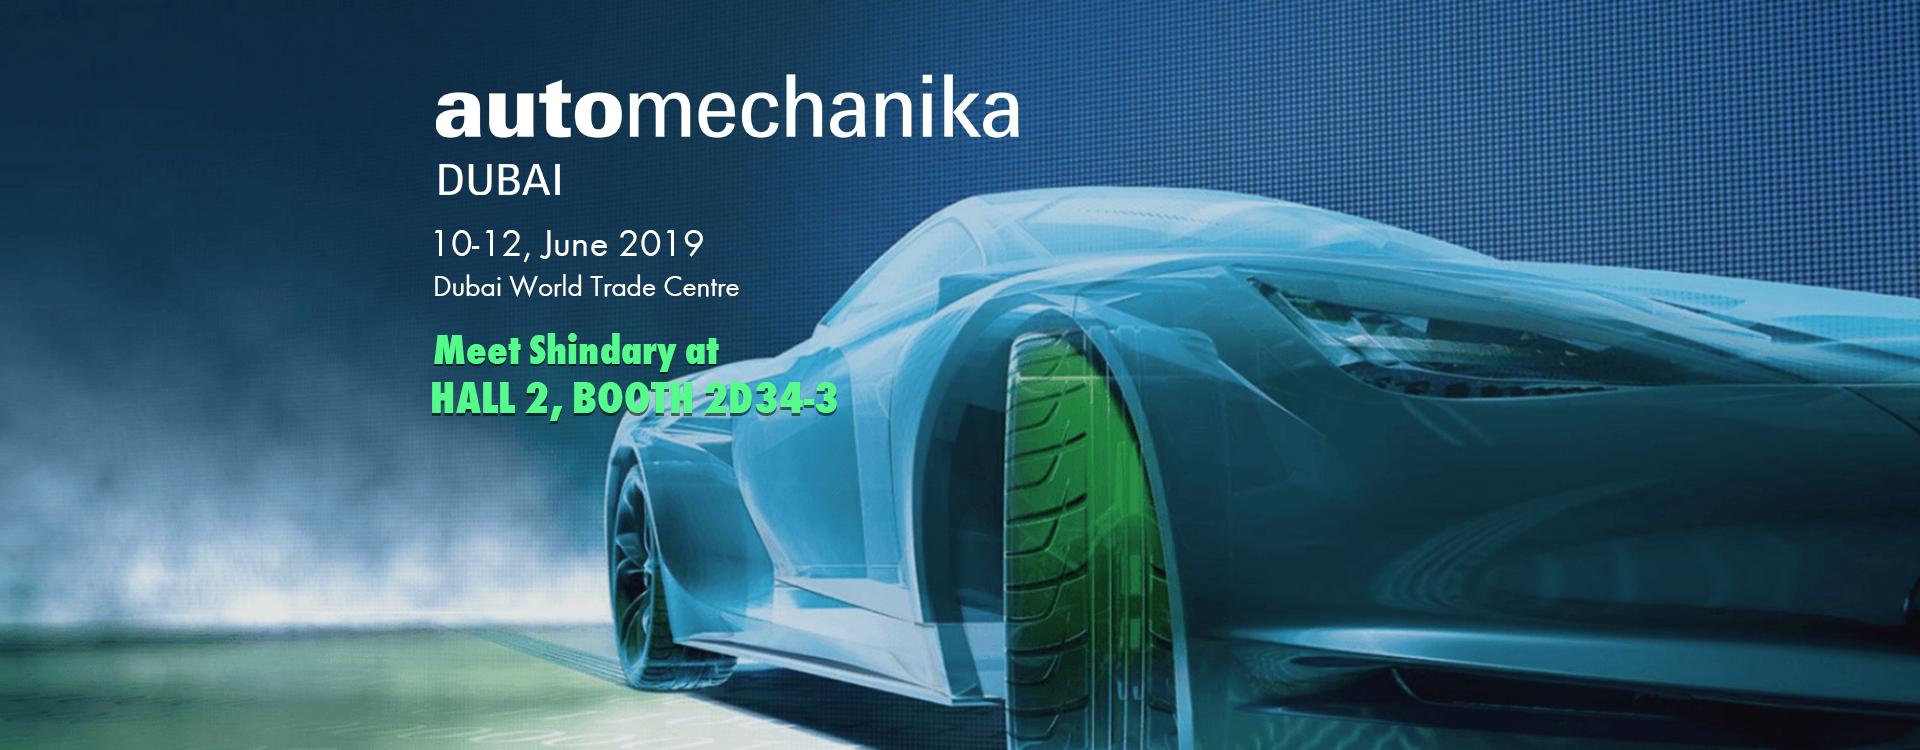 automechanika DUBAI 2019 SHINDARY AUTO PARTS